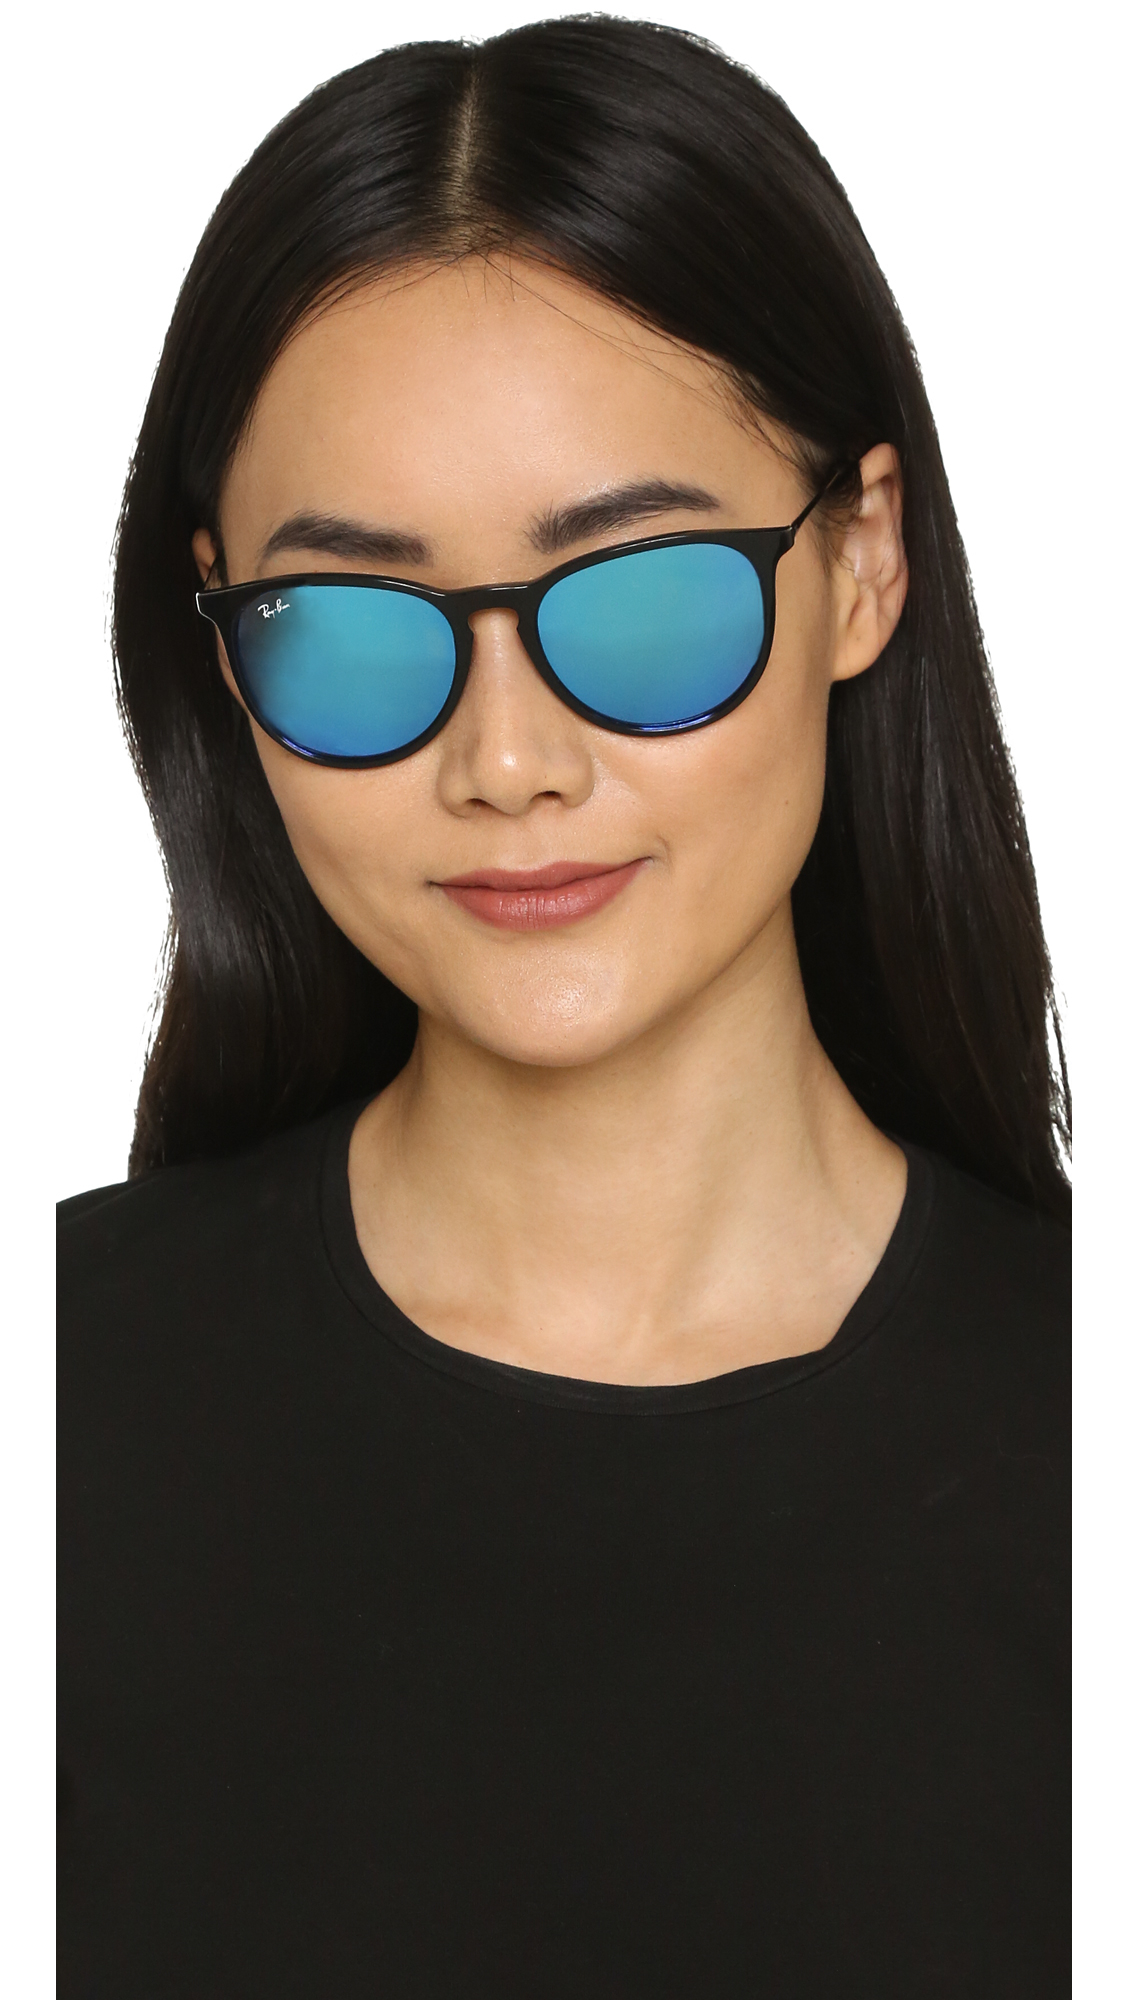 fd7d84d452 Ray-Ban Erika Sunglasses in Black - Lyst